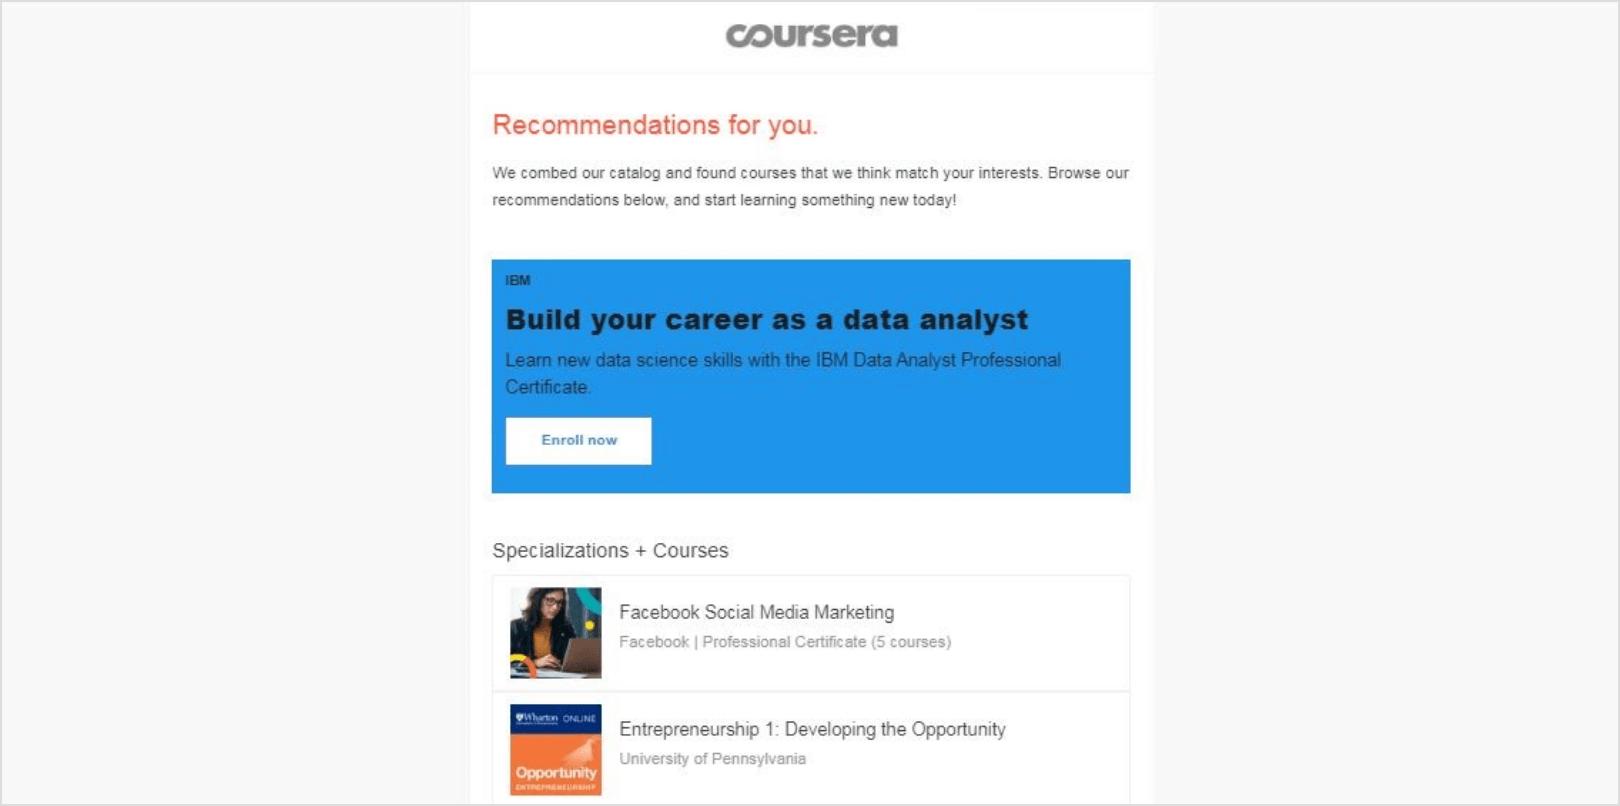 Personalized Marketing - Coursera